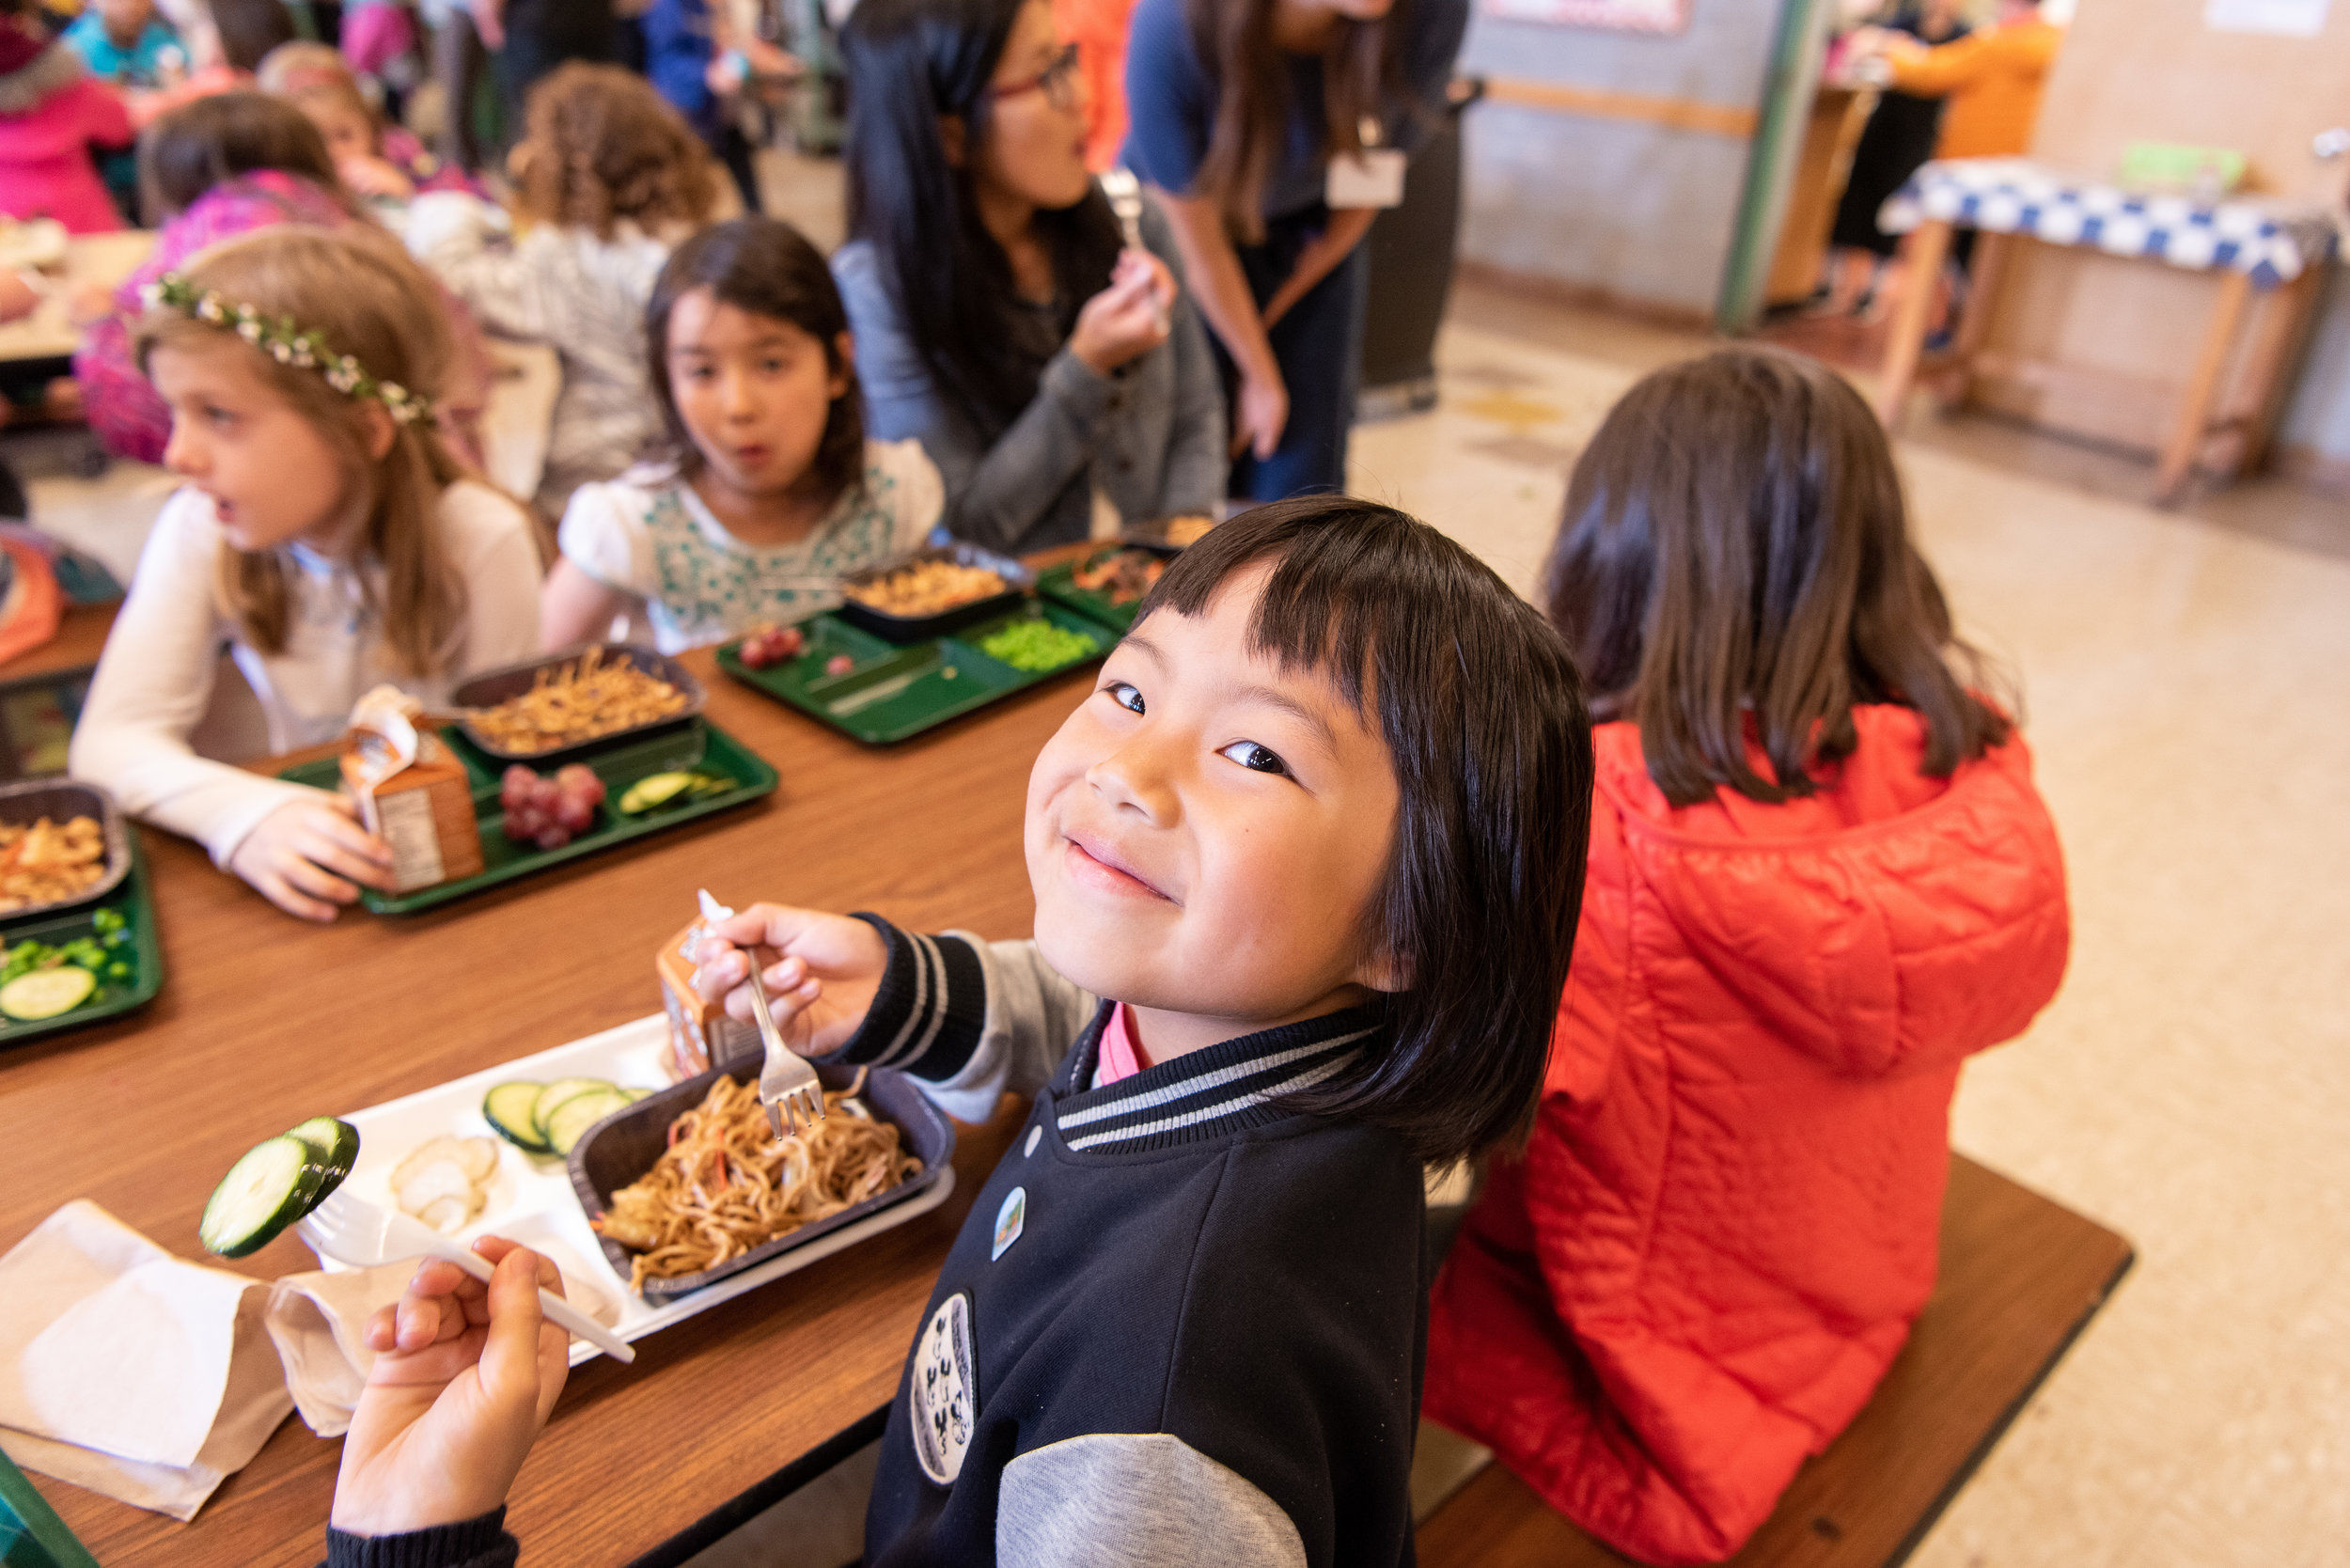 umi_school_lunch_cafeteria_0324.jpg